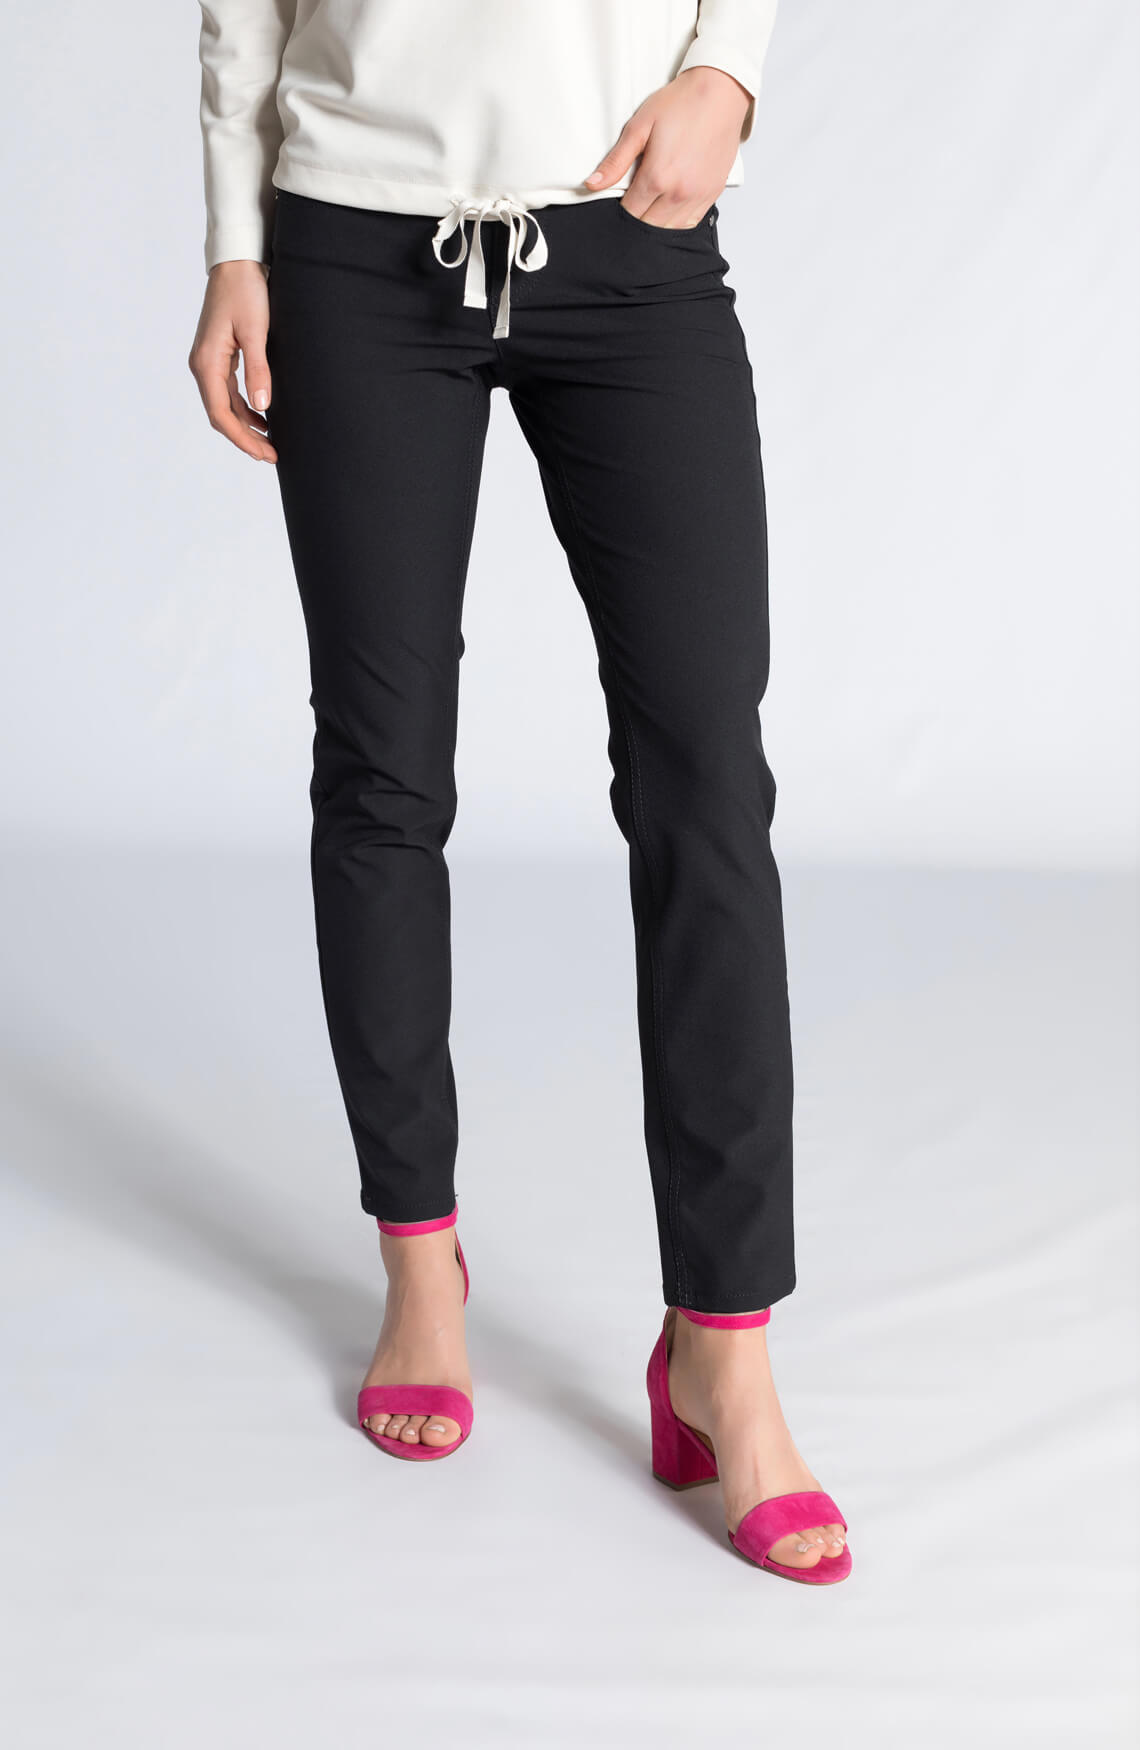 Cambio Dames Posh pantalon zwart